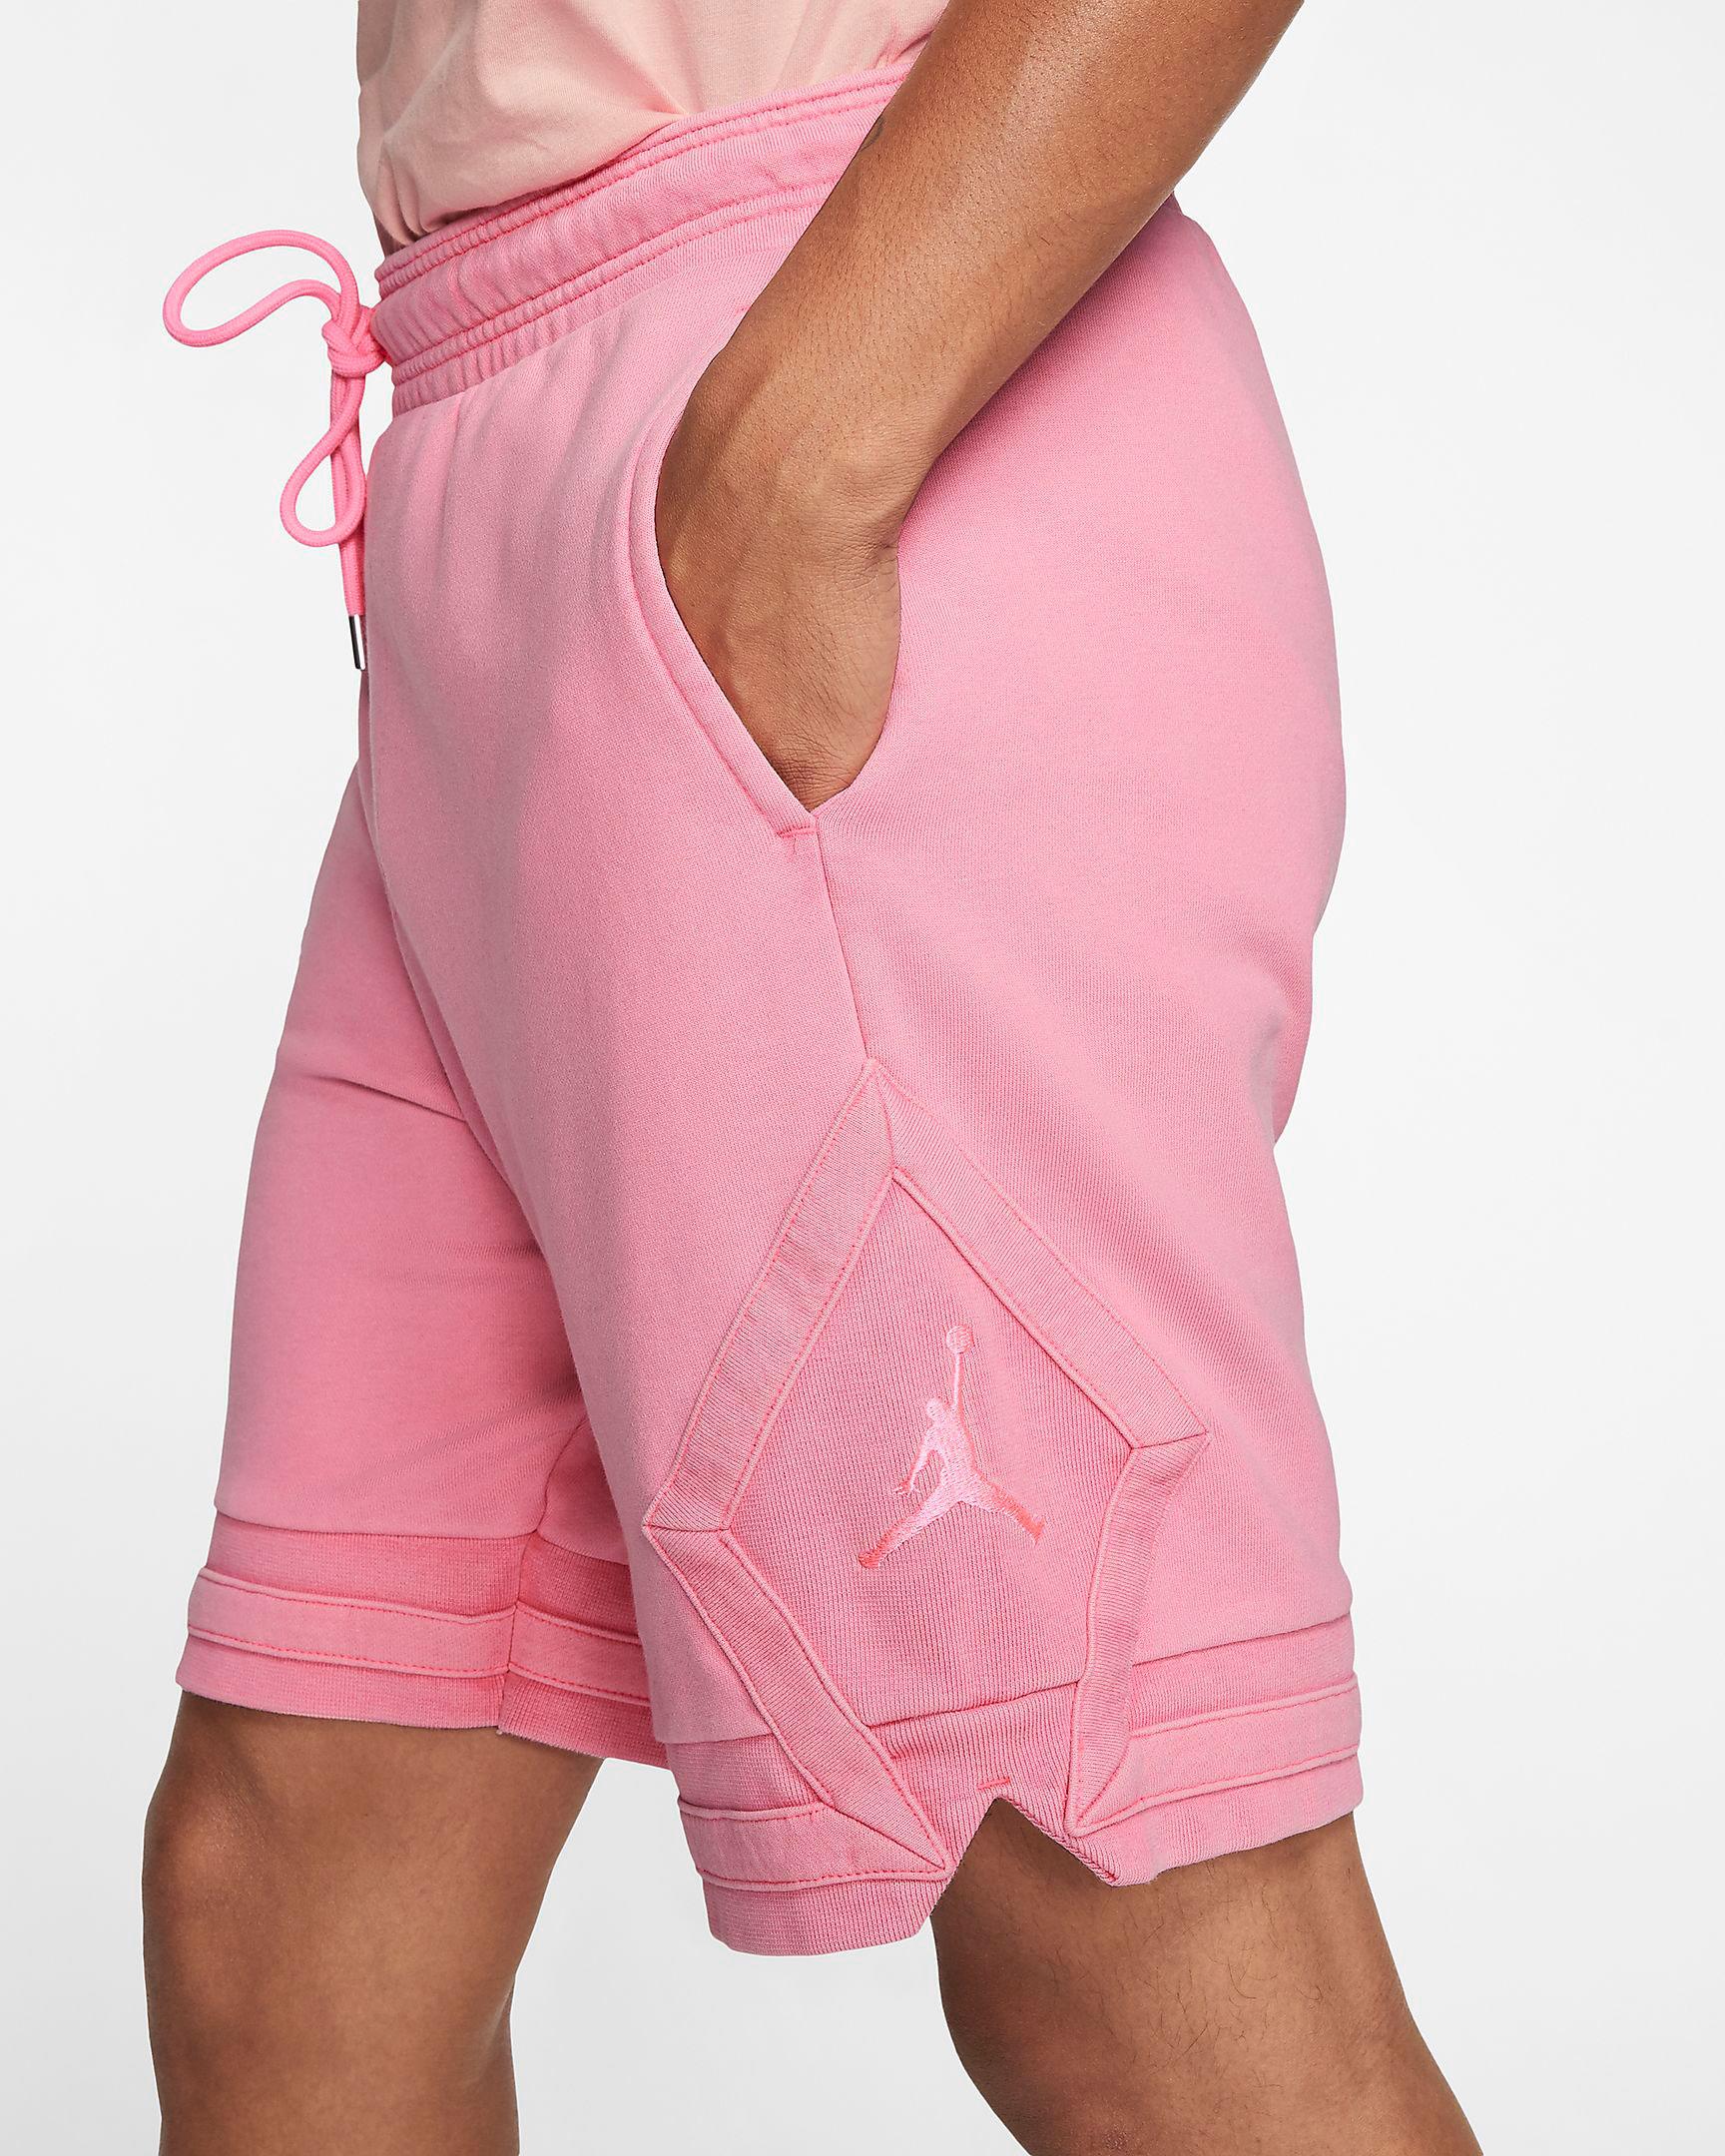 jordan-13-chinese-new-year-pink-shorts